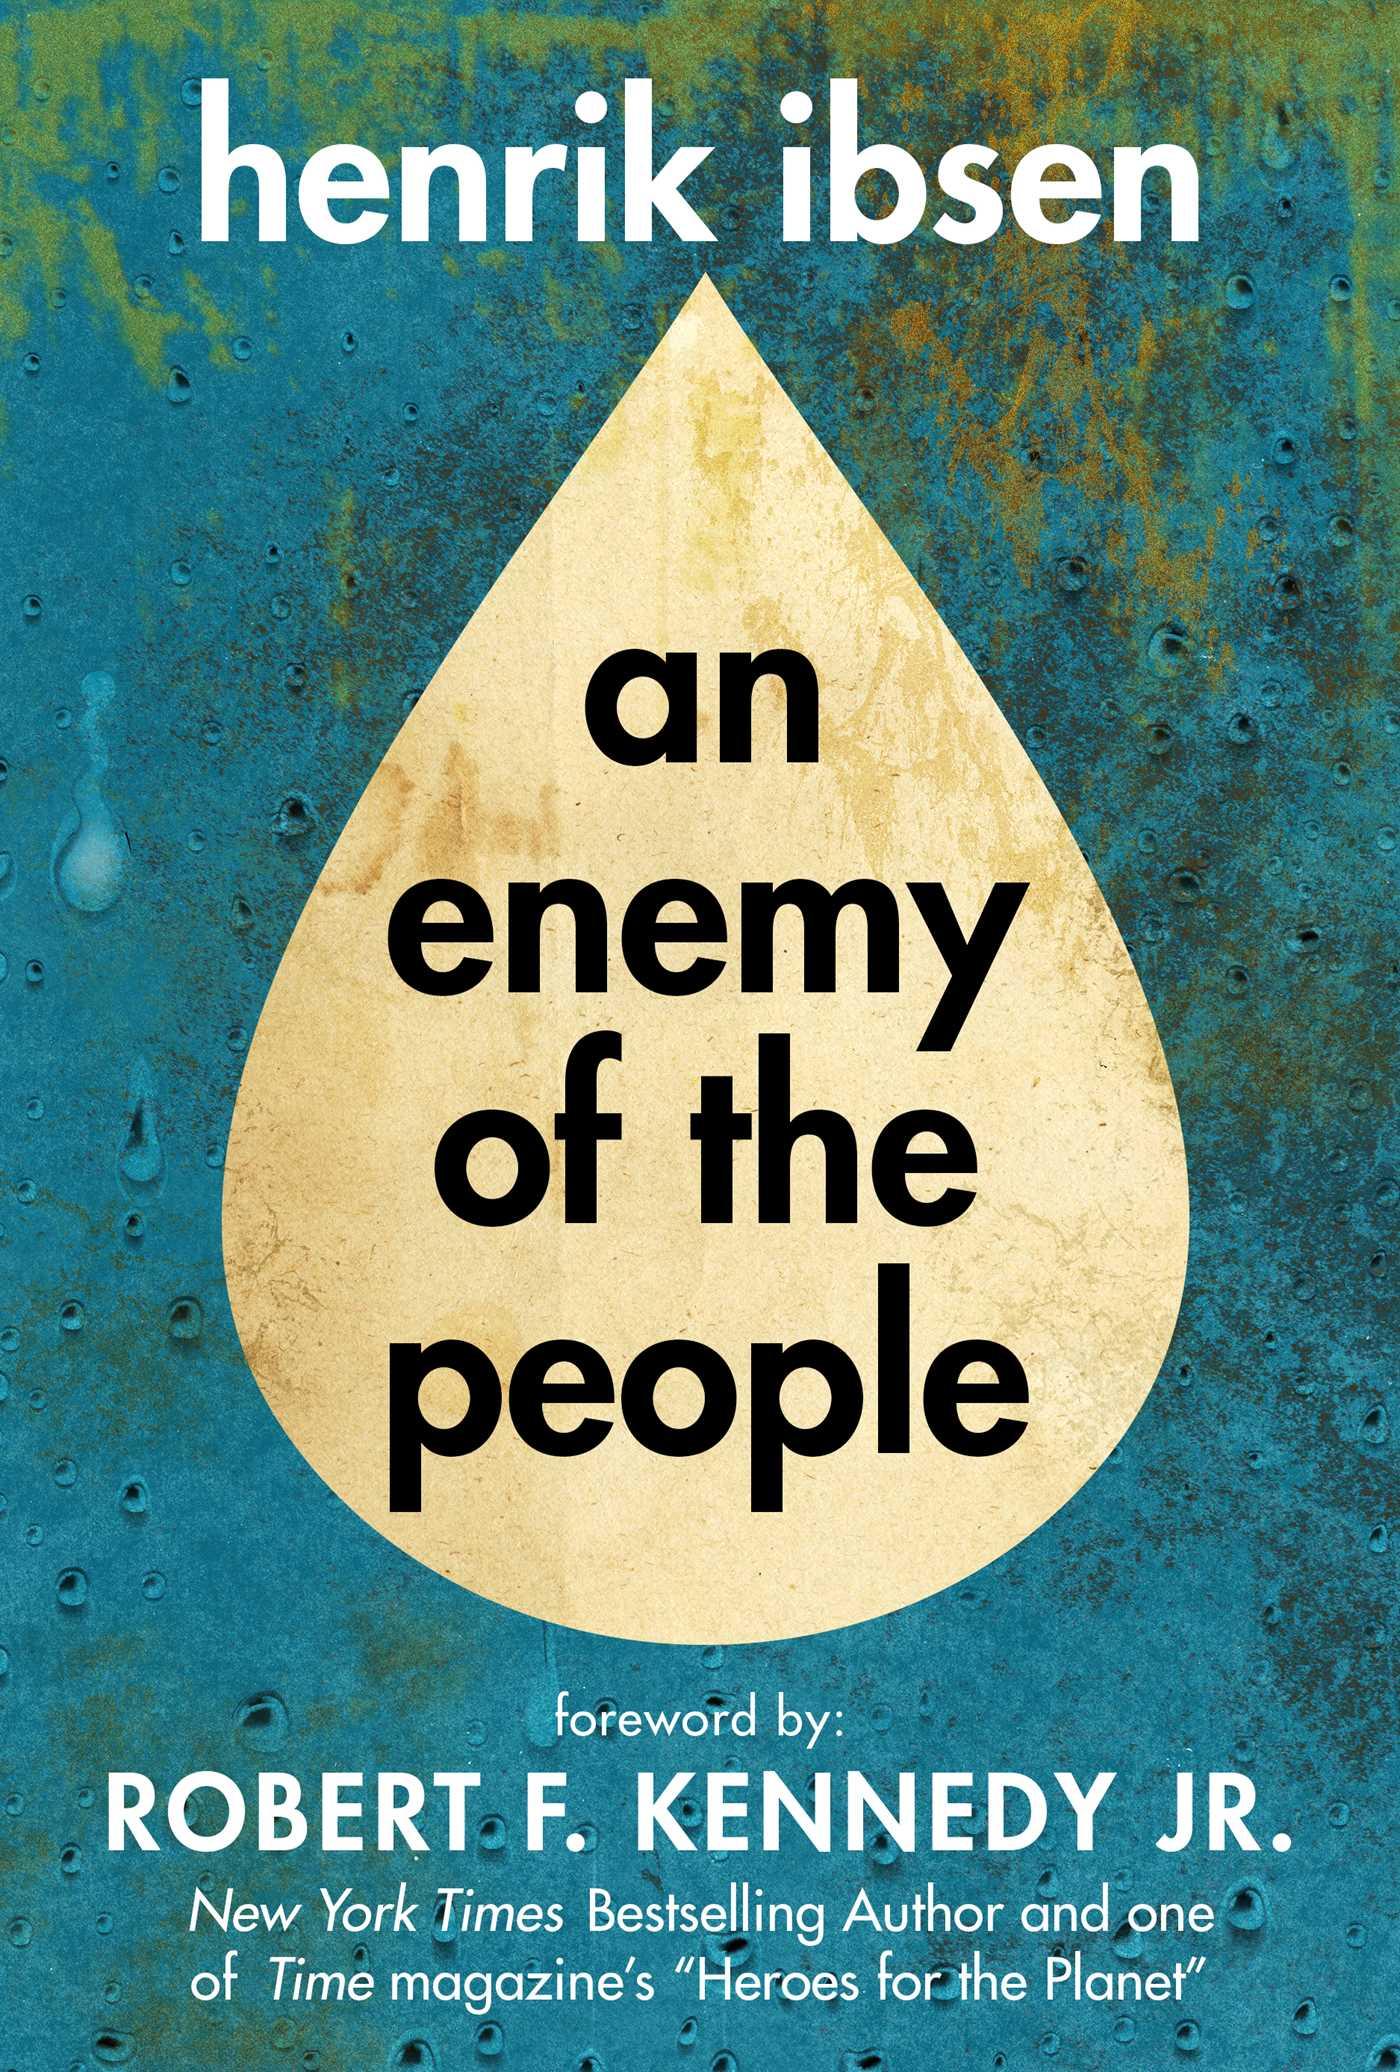 Ebook An Enemy Of The People By Henrik Ibsen